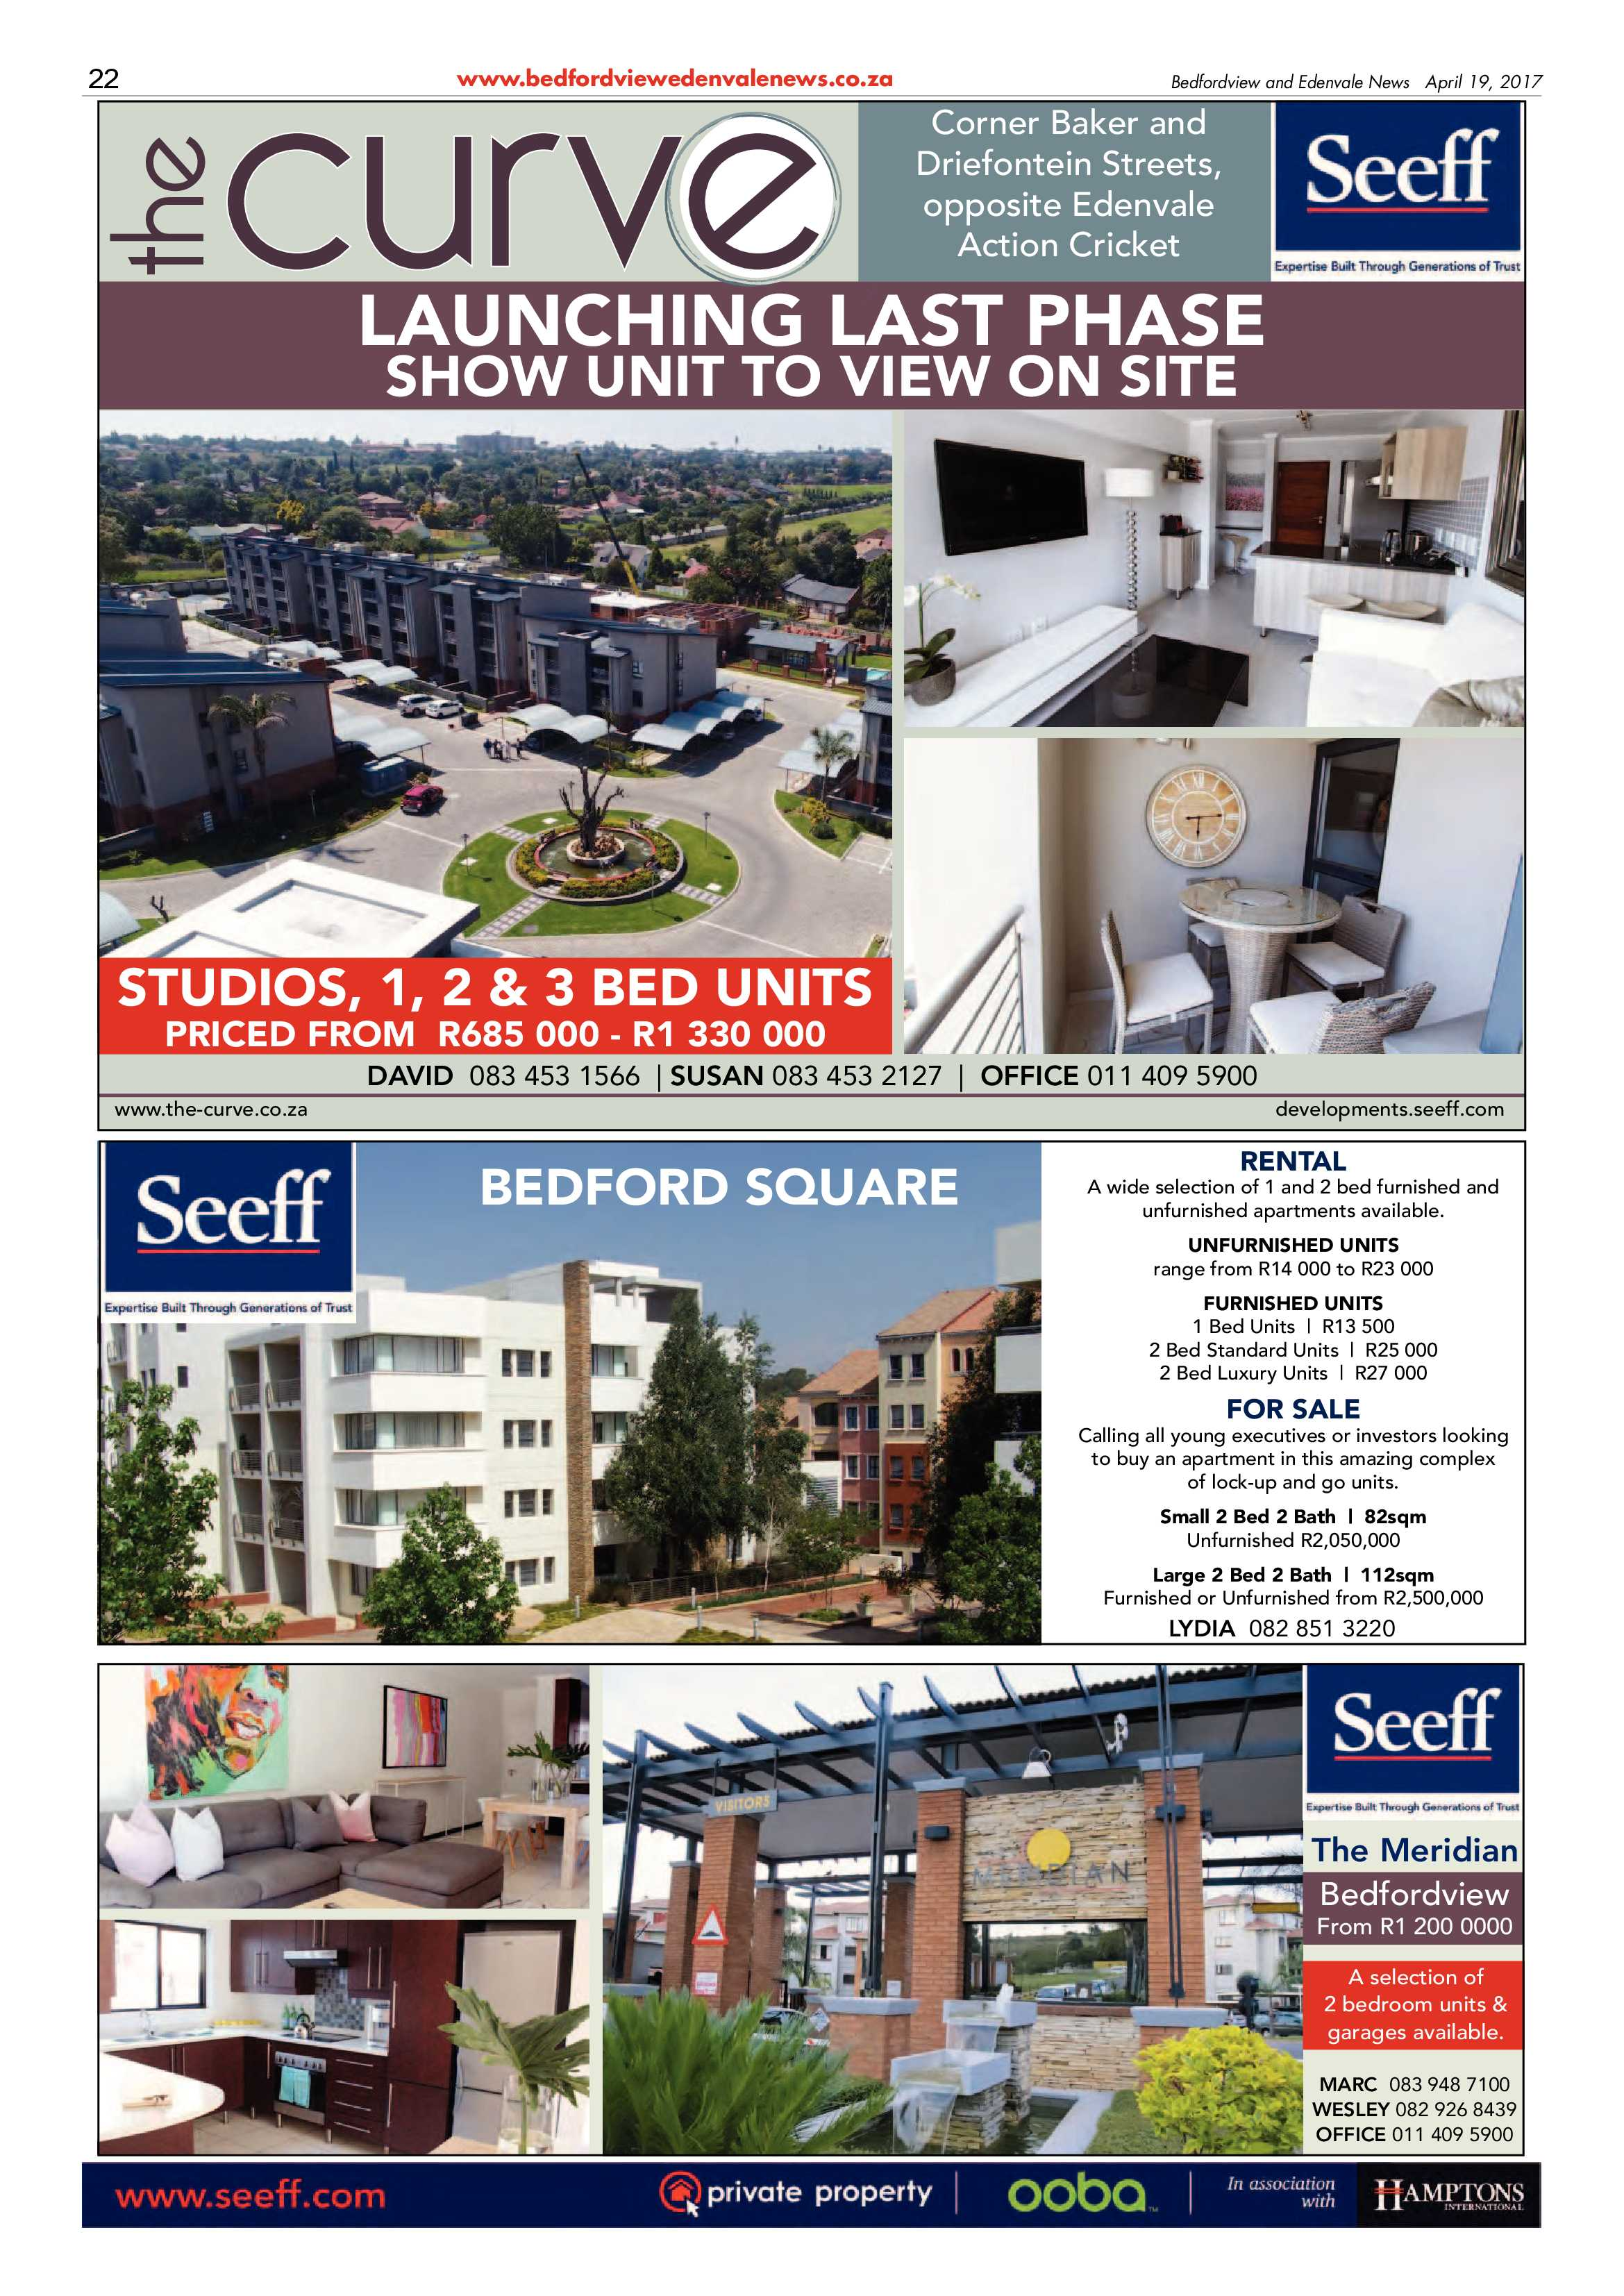 bedfordview-edenvale-news-19-april-2017-epapers-page-22